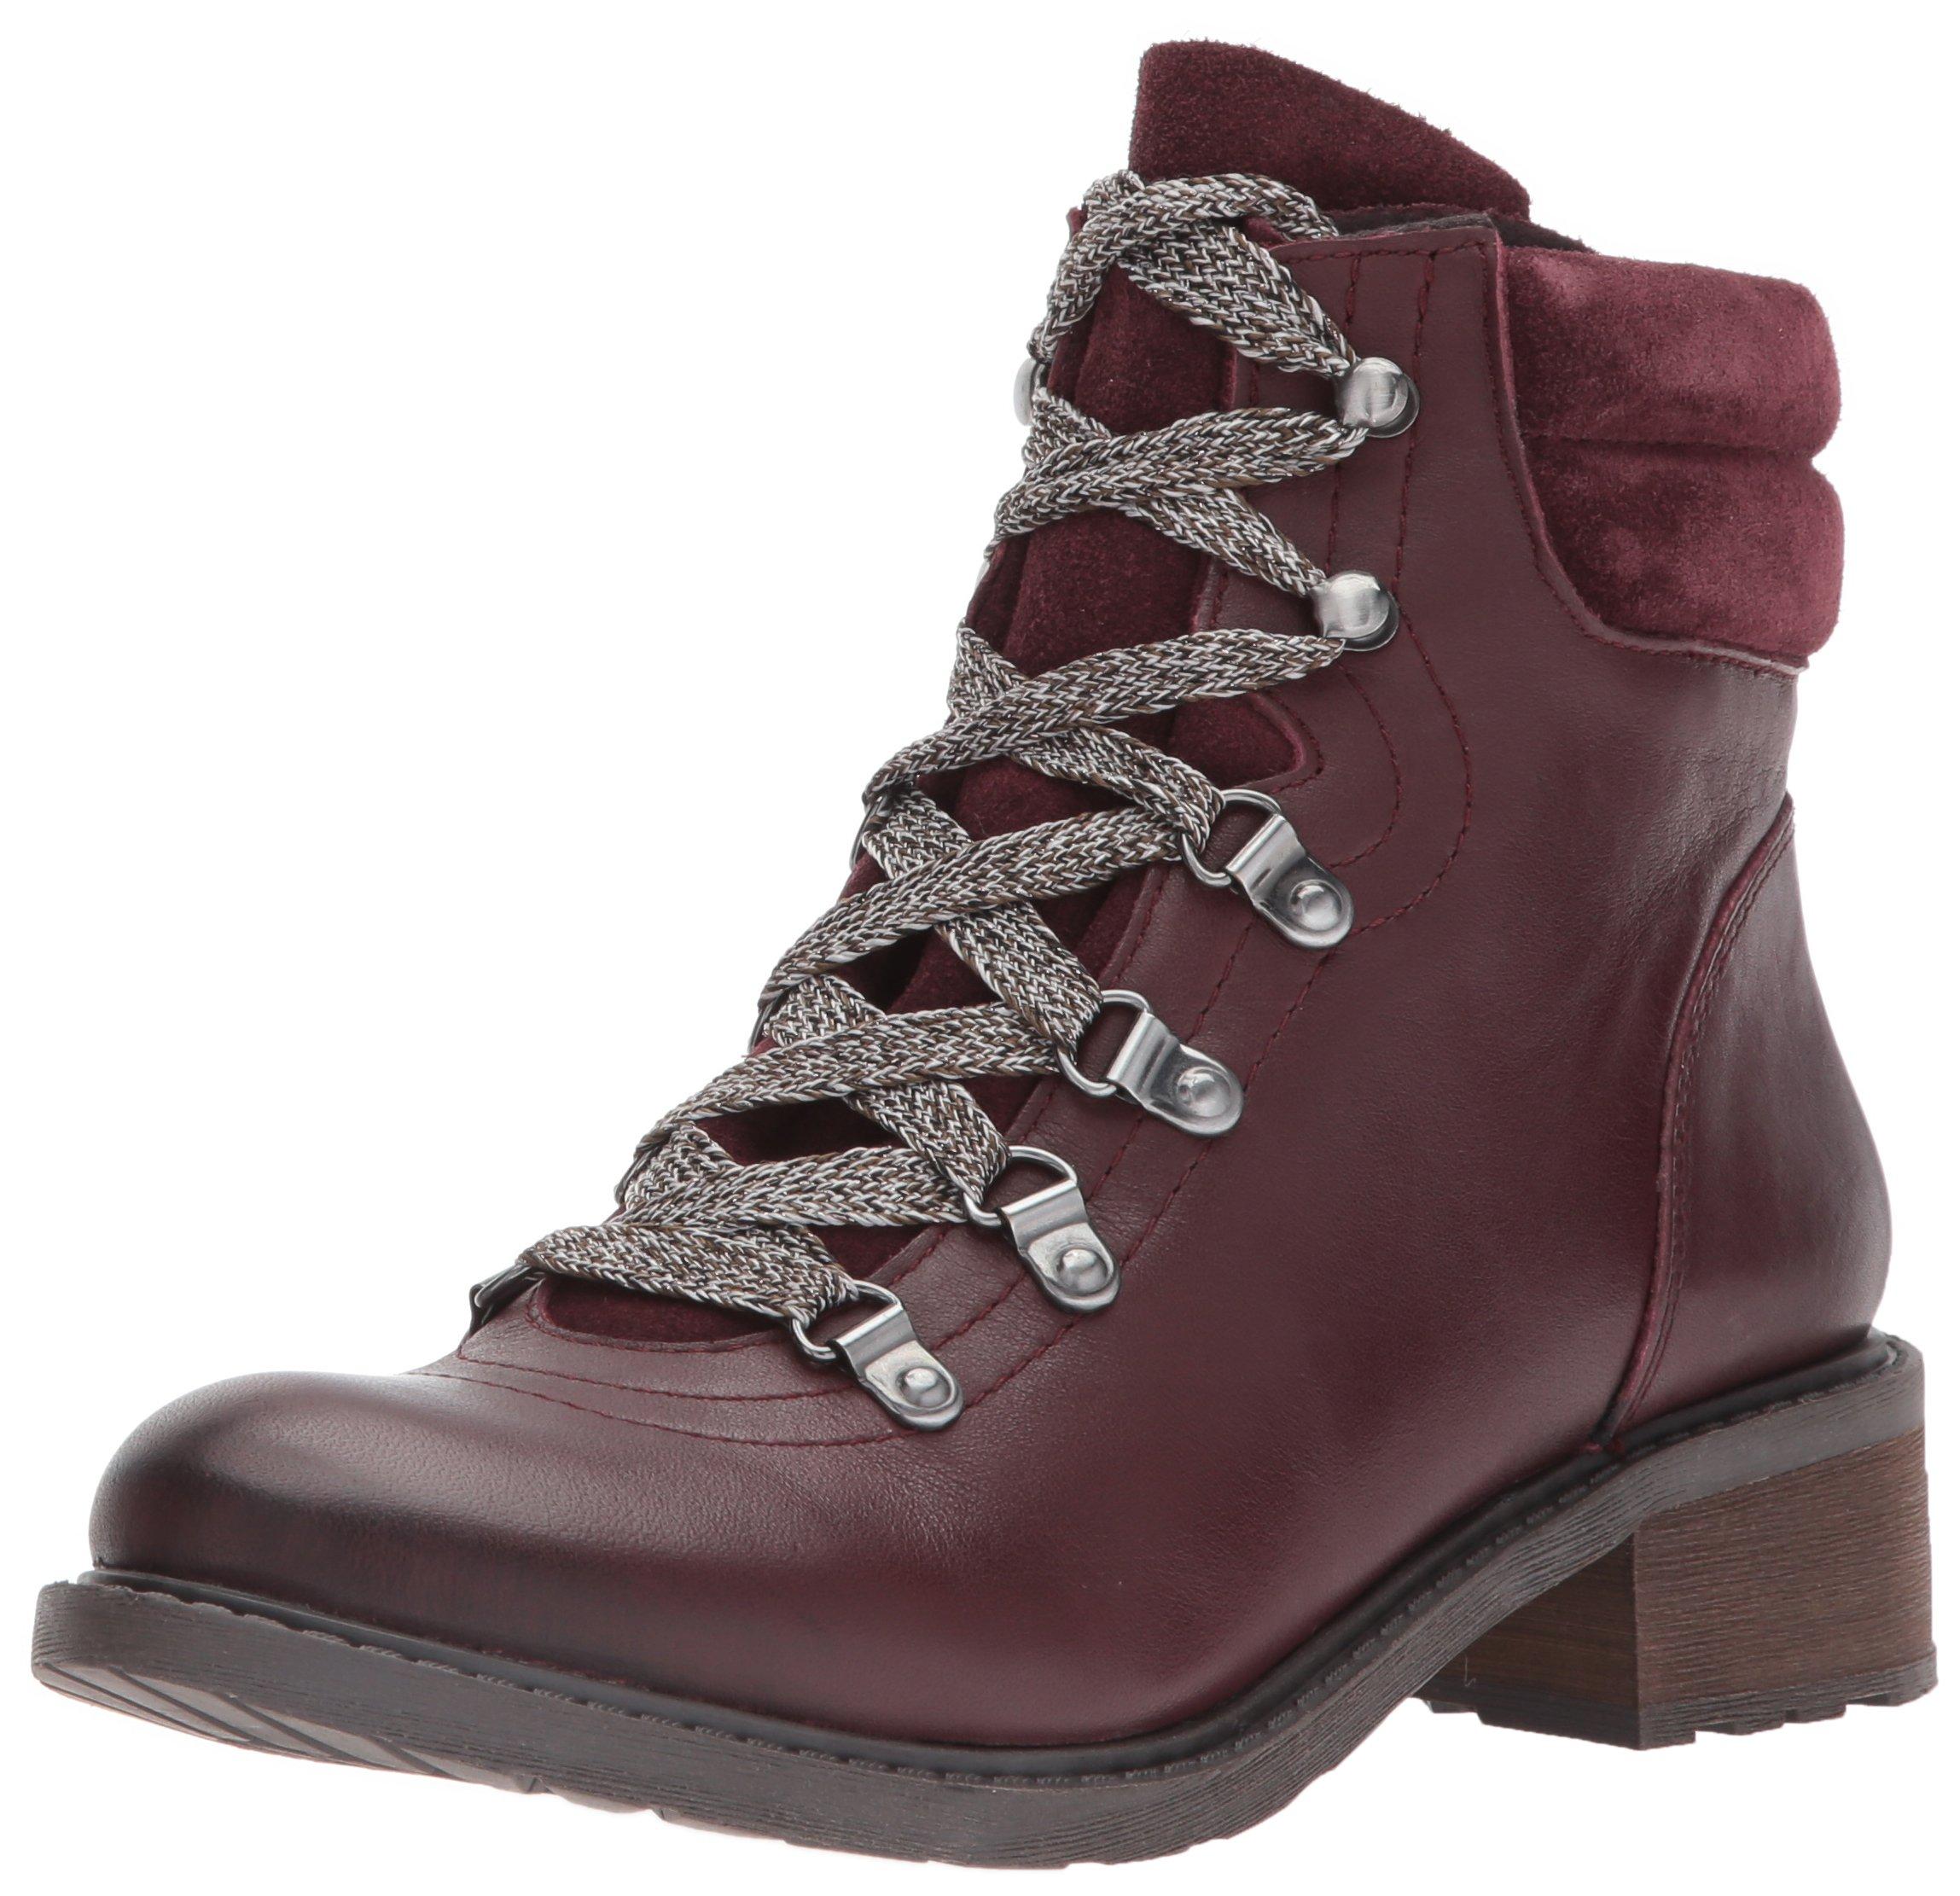 Sam Edelman Women's Darrah Ankle Boot, Malbec, 10.5 Medium US by Sam Edelman